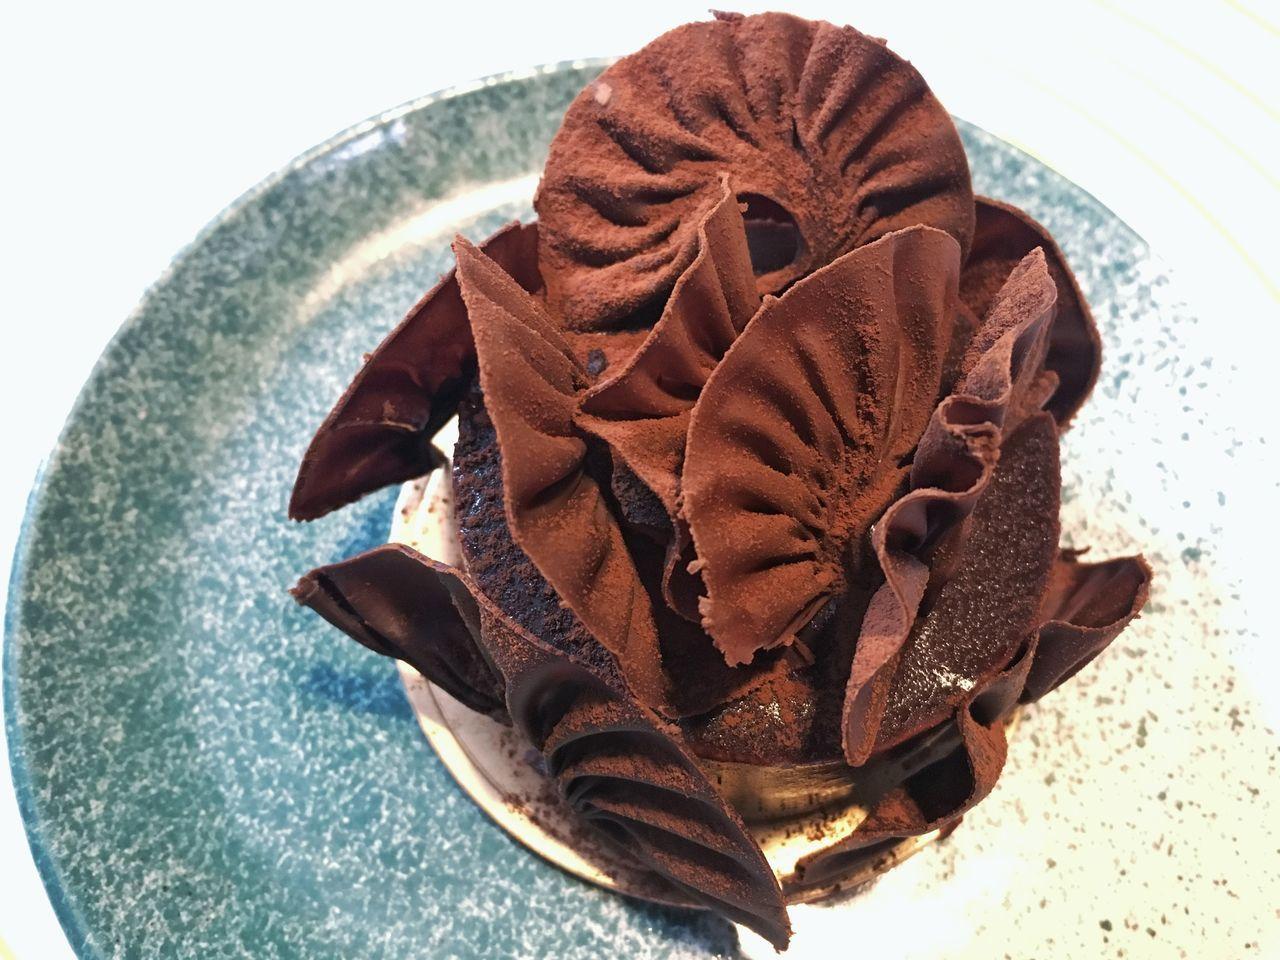 Dessert Dessert Porn Dessert Time! Dessert... Mmmmm Yum Yum  Dessertoftheday Dessert Topping dessert #food #desserts #TagsForLikes #yum #yummy #amazing #instagood #instafood #sweet #chocolate #cake #icecream #dessertporn #delish #foods #delicious #tasty #eat #eating #hungry foodpics sweettooth Desserts! Dessertforacause Dessertheaven First Eyeem Photo